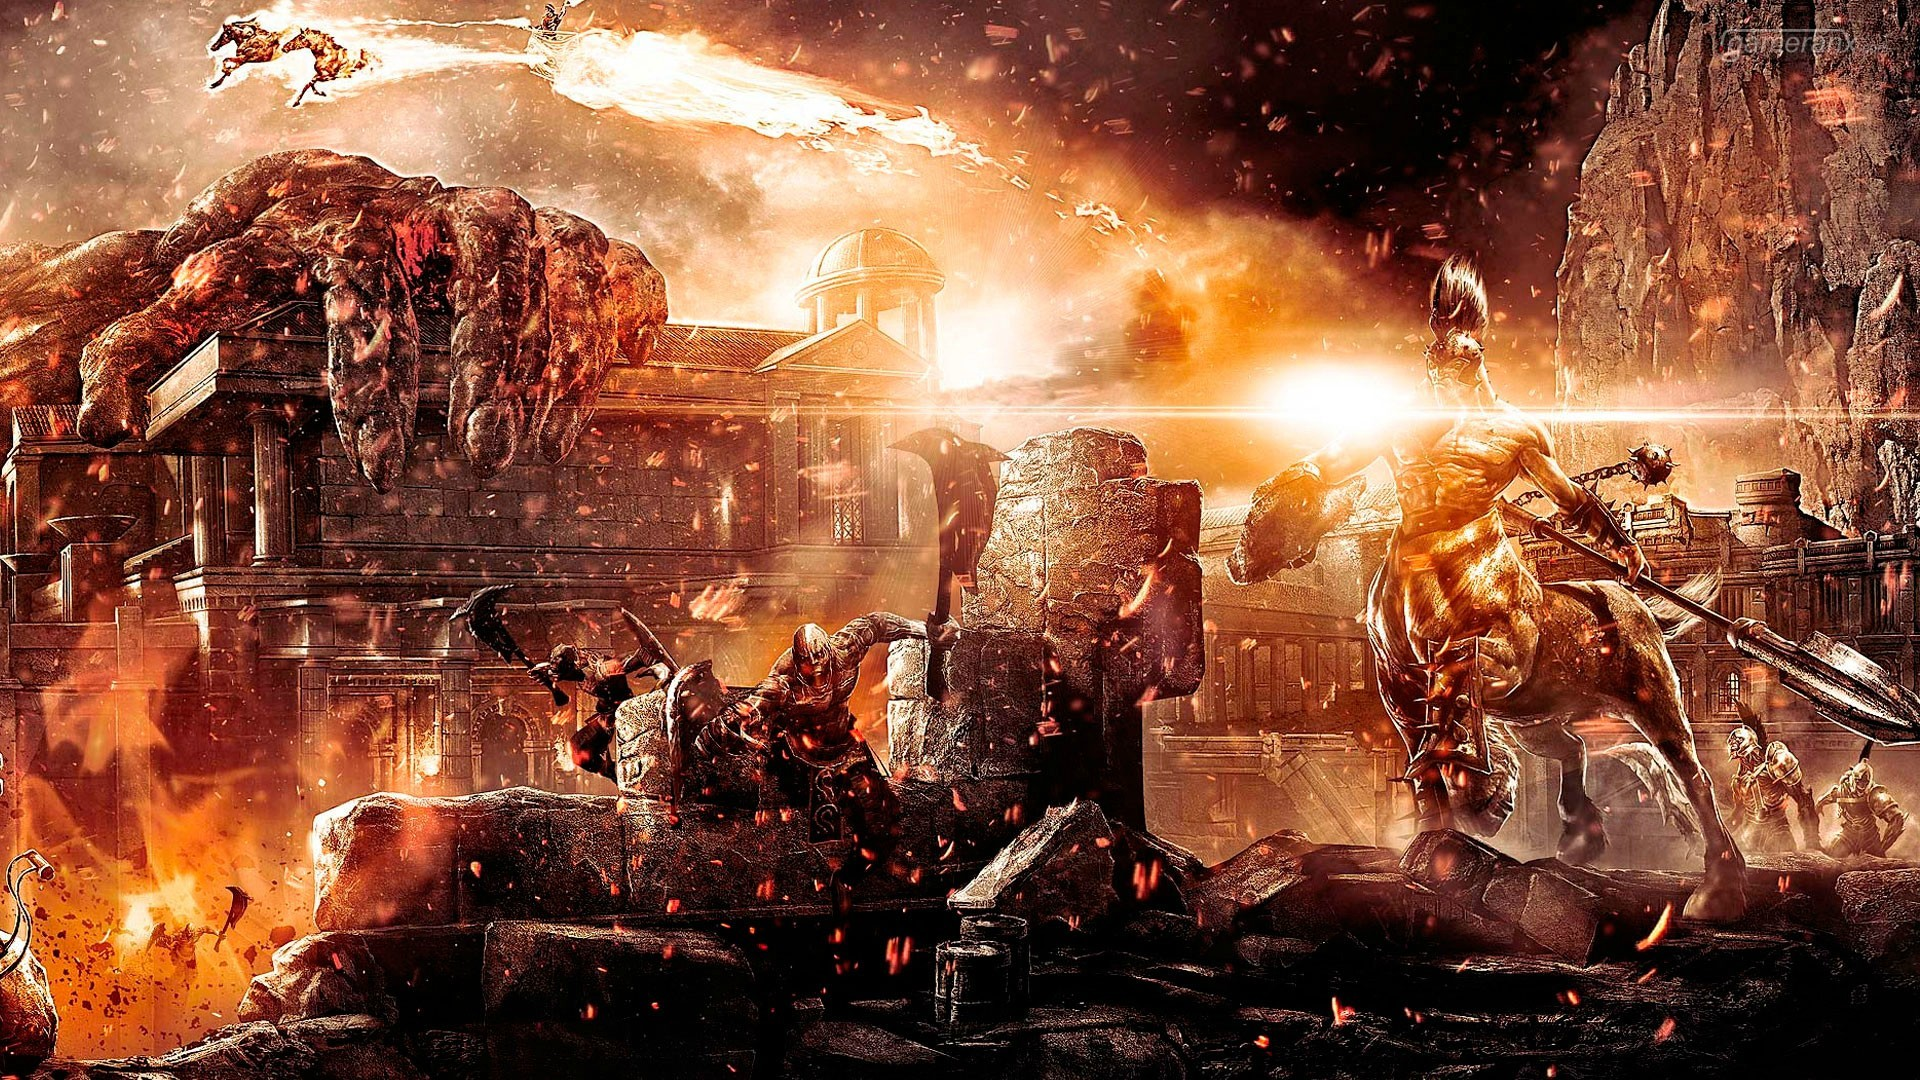 God of War 3 Game HD desktop wallpaper, God of War wallpaper – Games no.